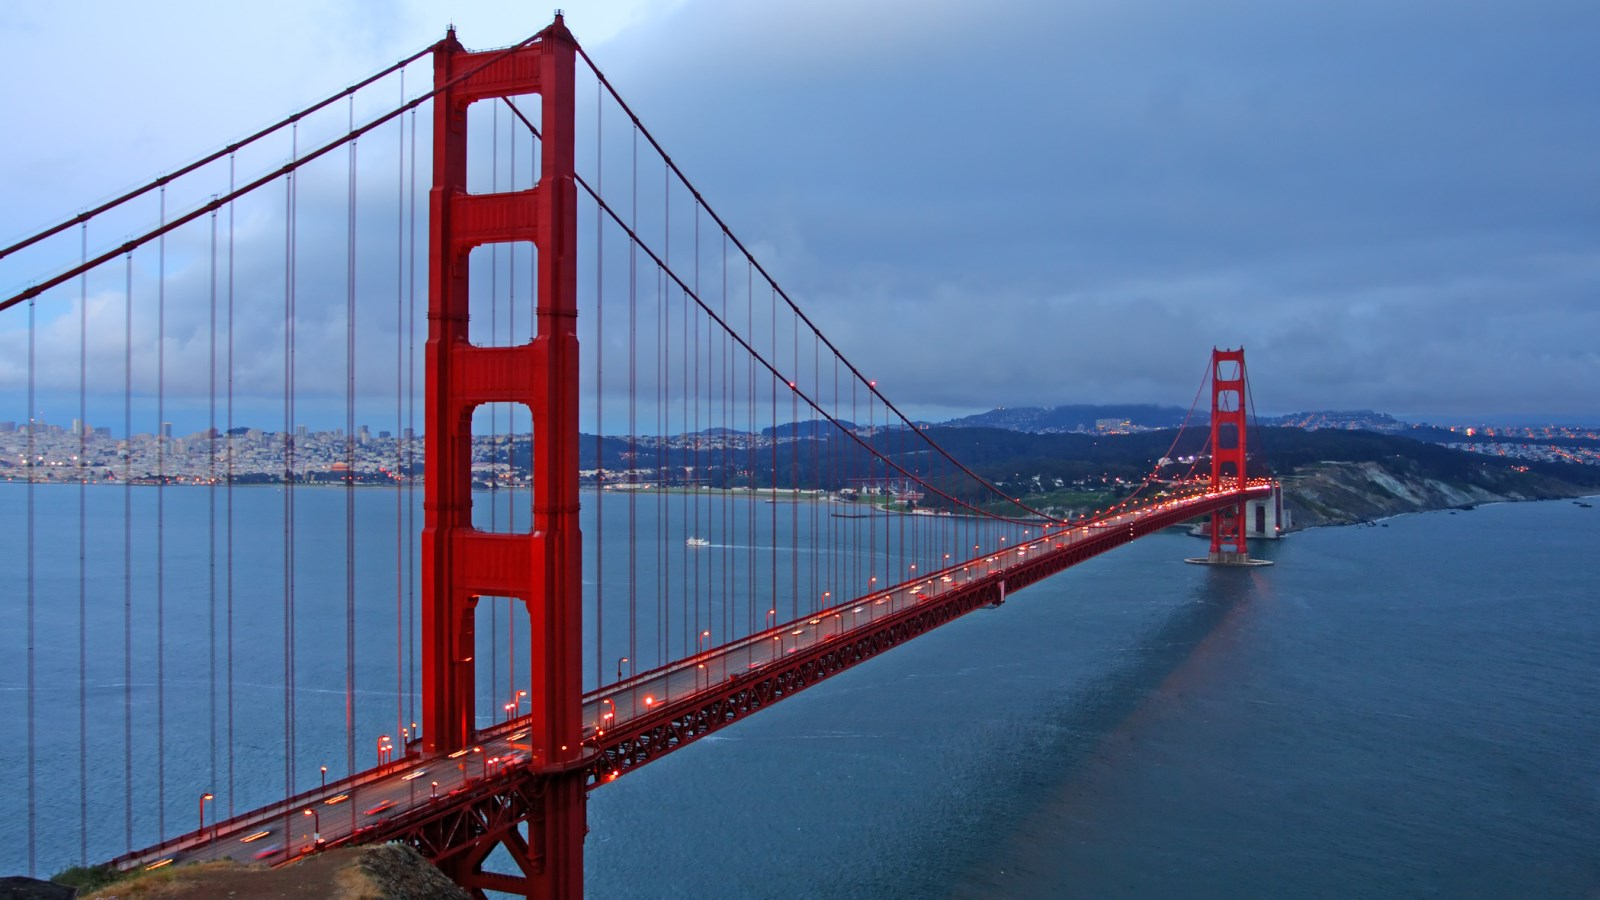 NEWwes1007wn-137124-Golden-Gate-Bridge.jpg